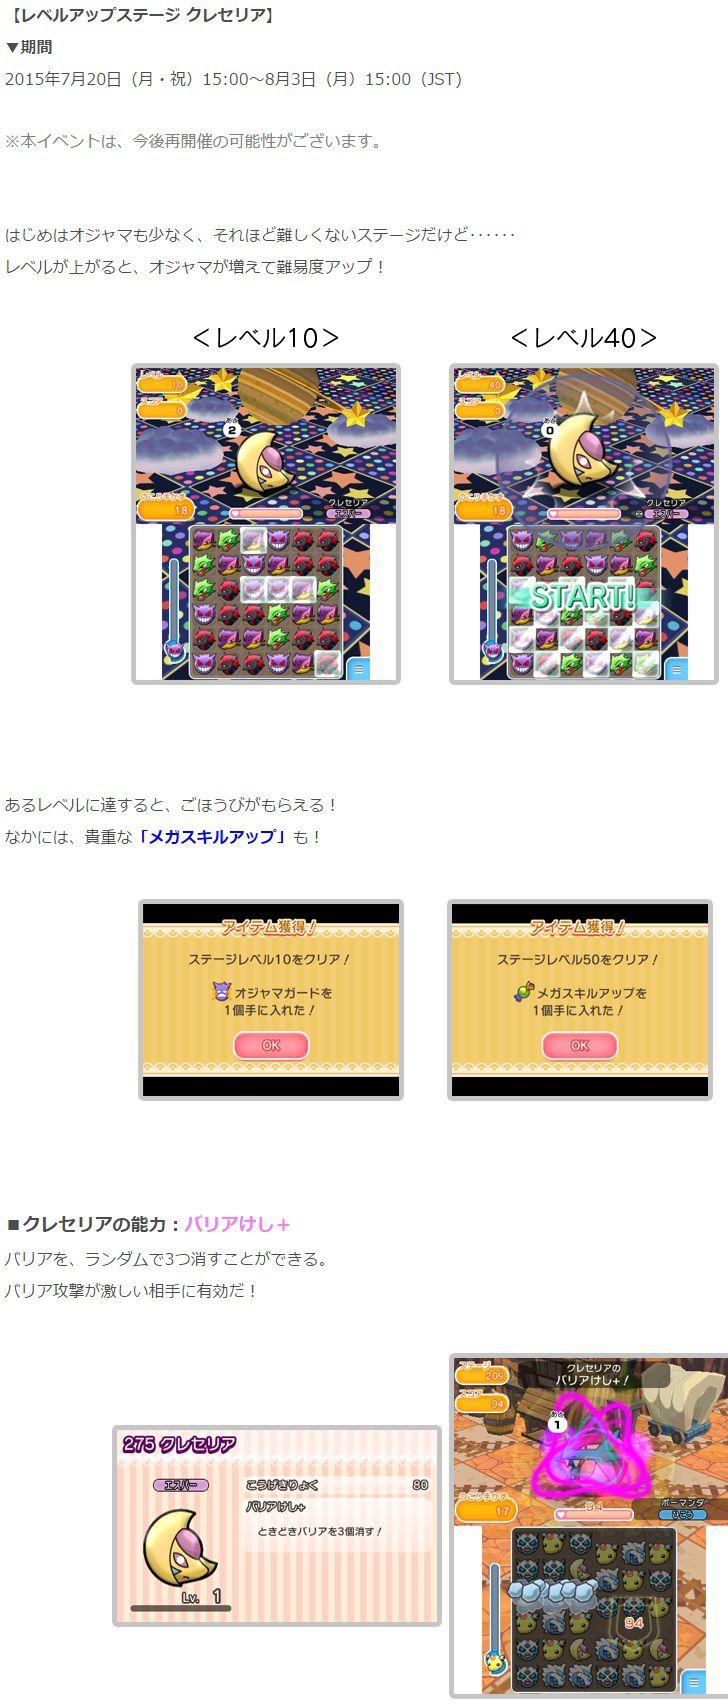 image_5650.jpg